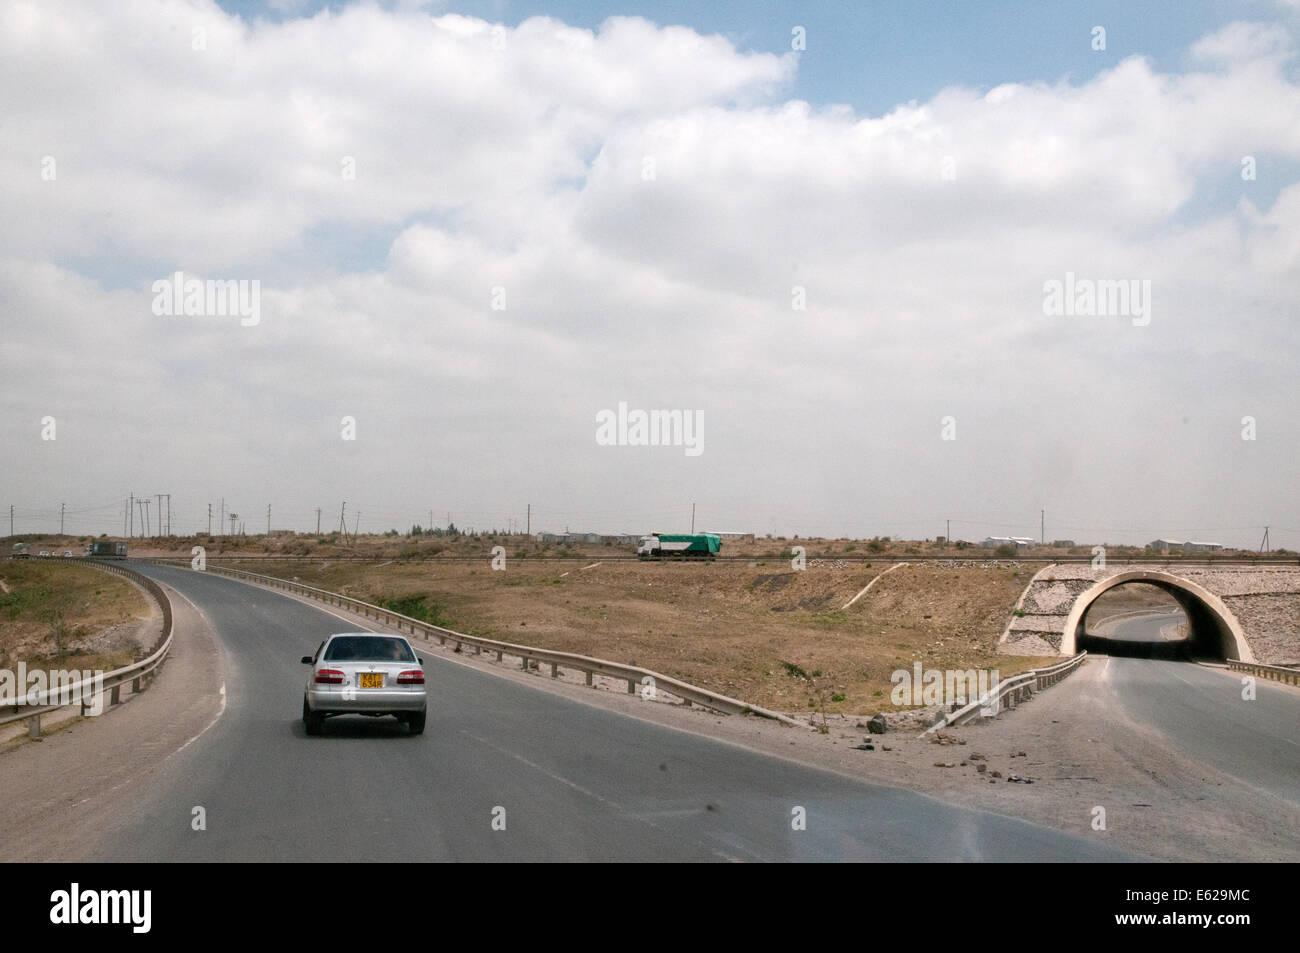 Gleiten Sie Straßen- und Underspass Tunnel, wo mündet Namanga Straße Mombasa-Nairobi-Highway am Athi Stockbild